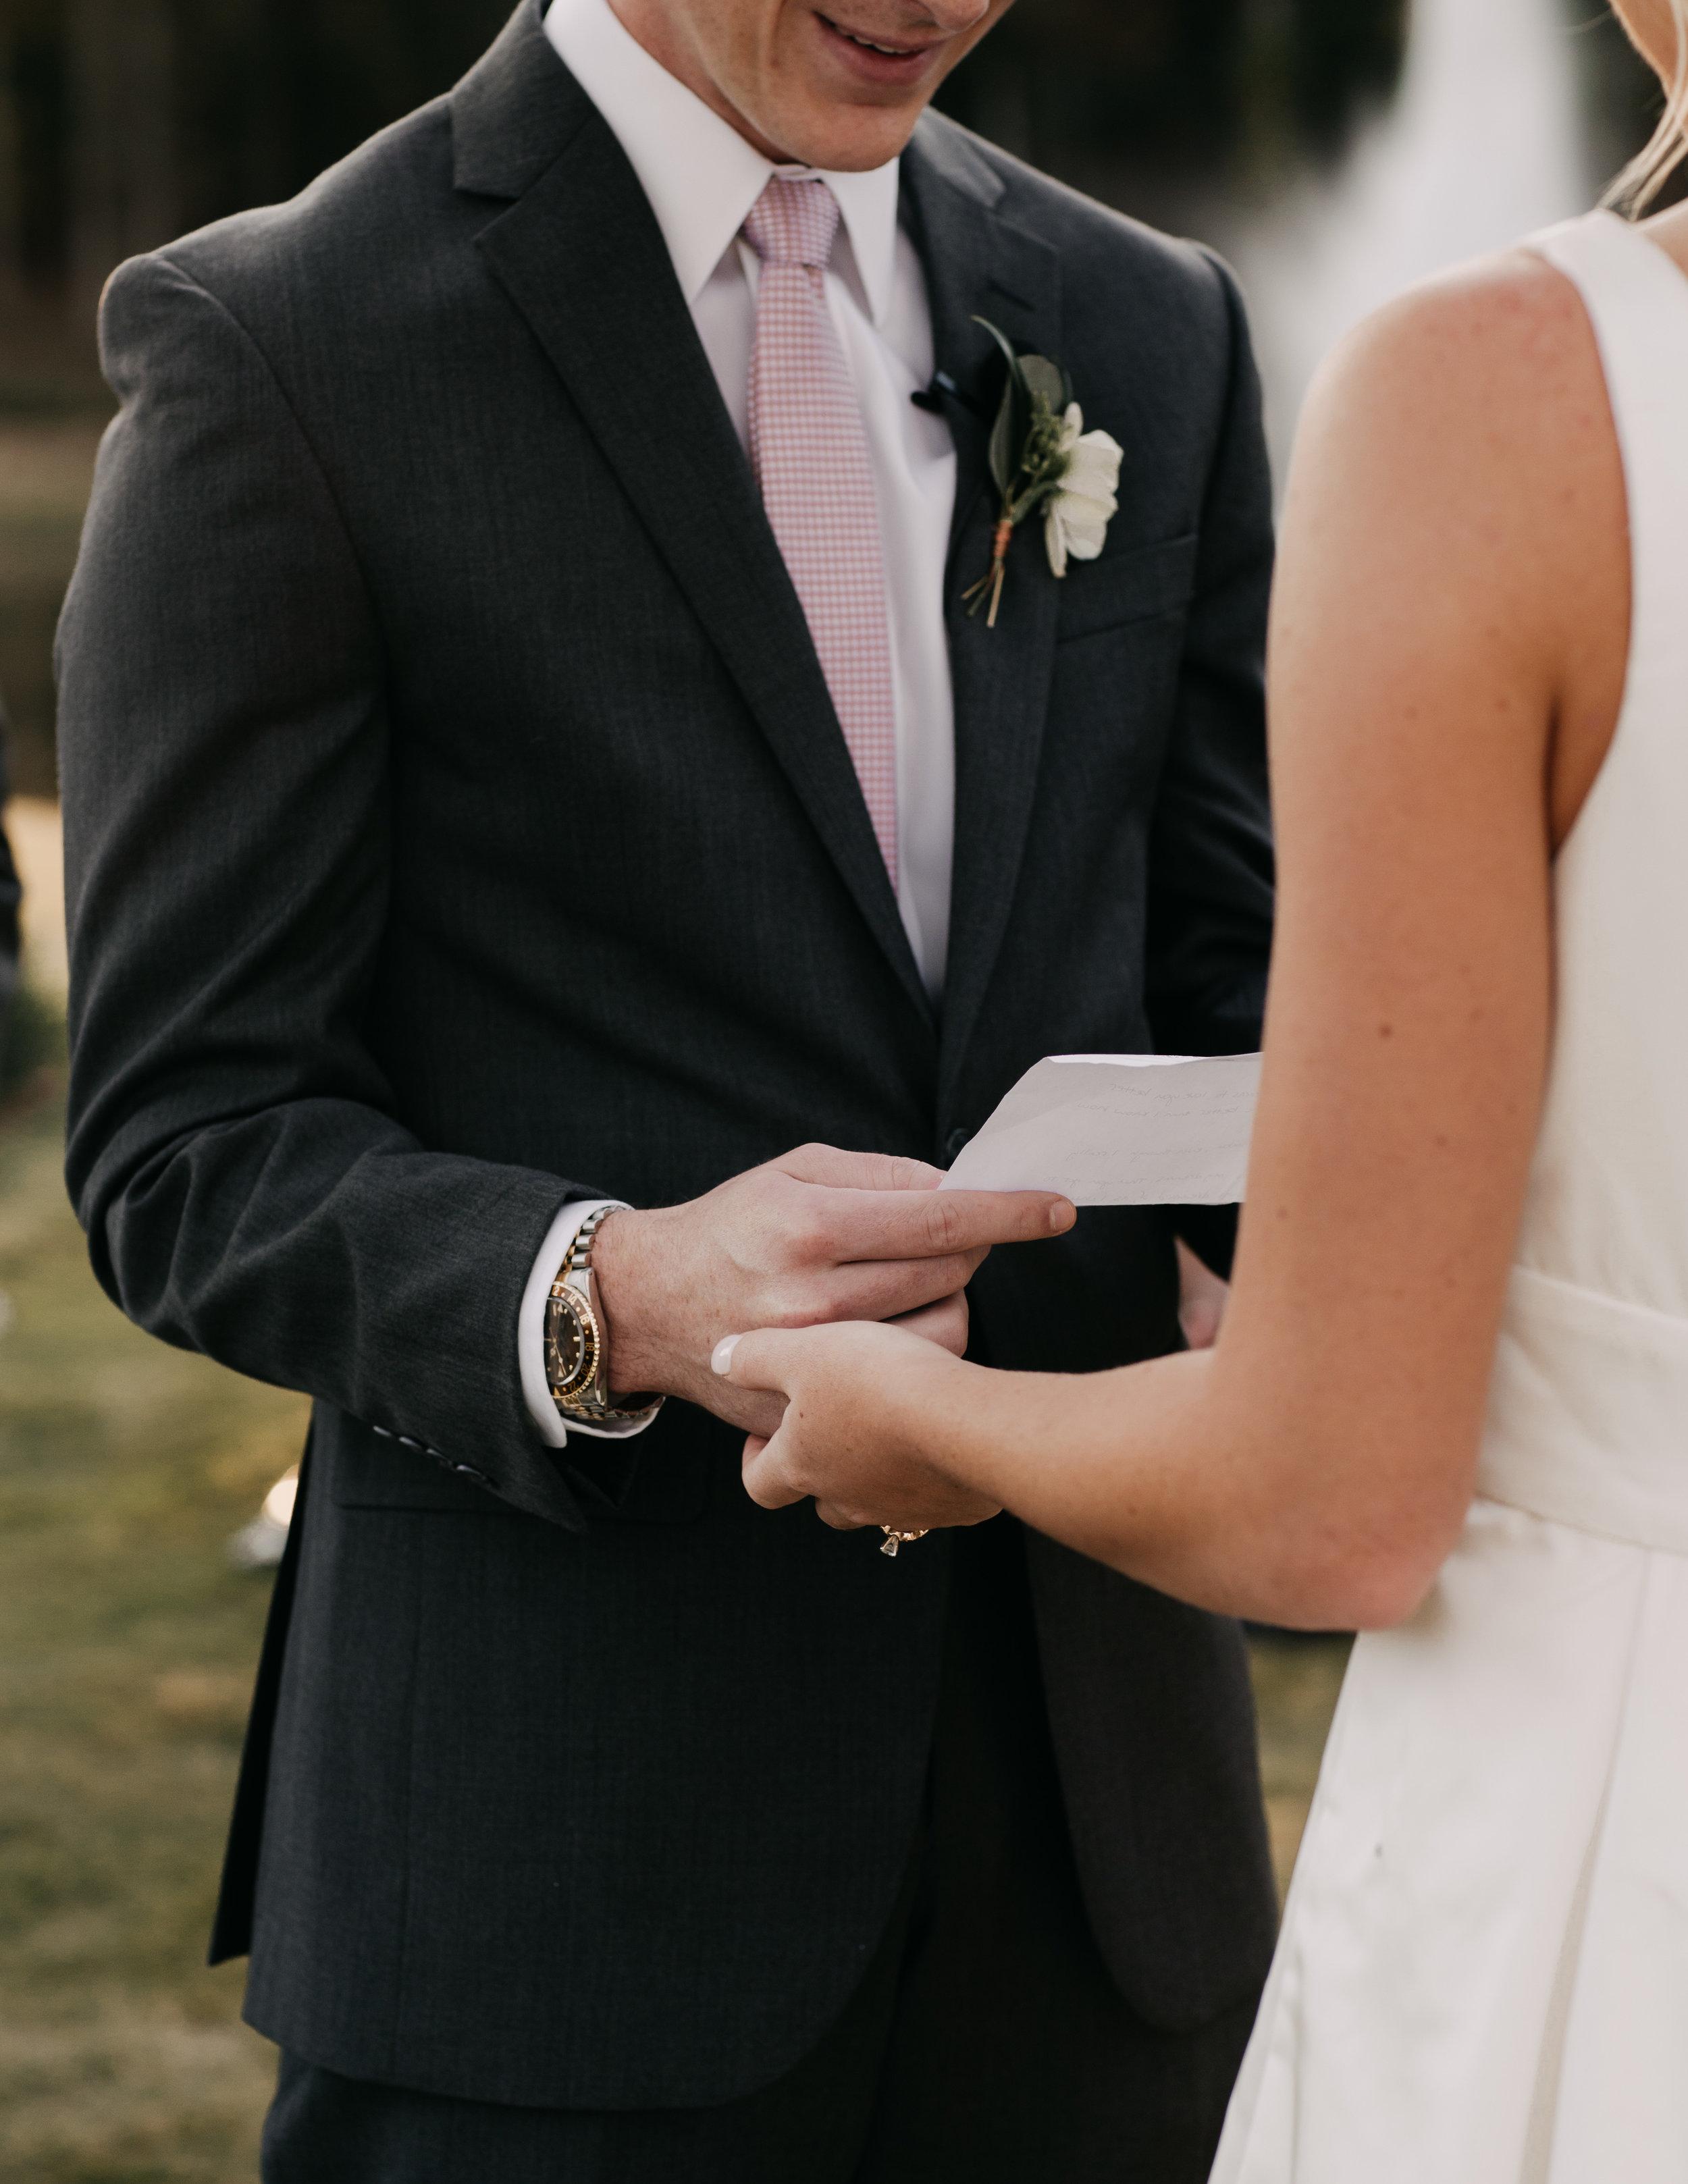 Kaylyn & Ryan Final Wedding Photos377.jpg